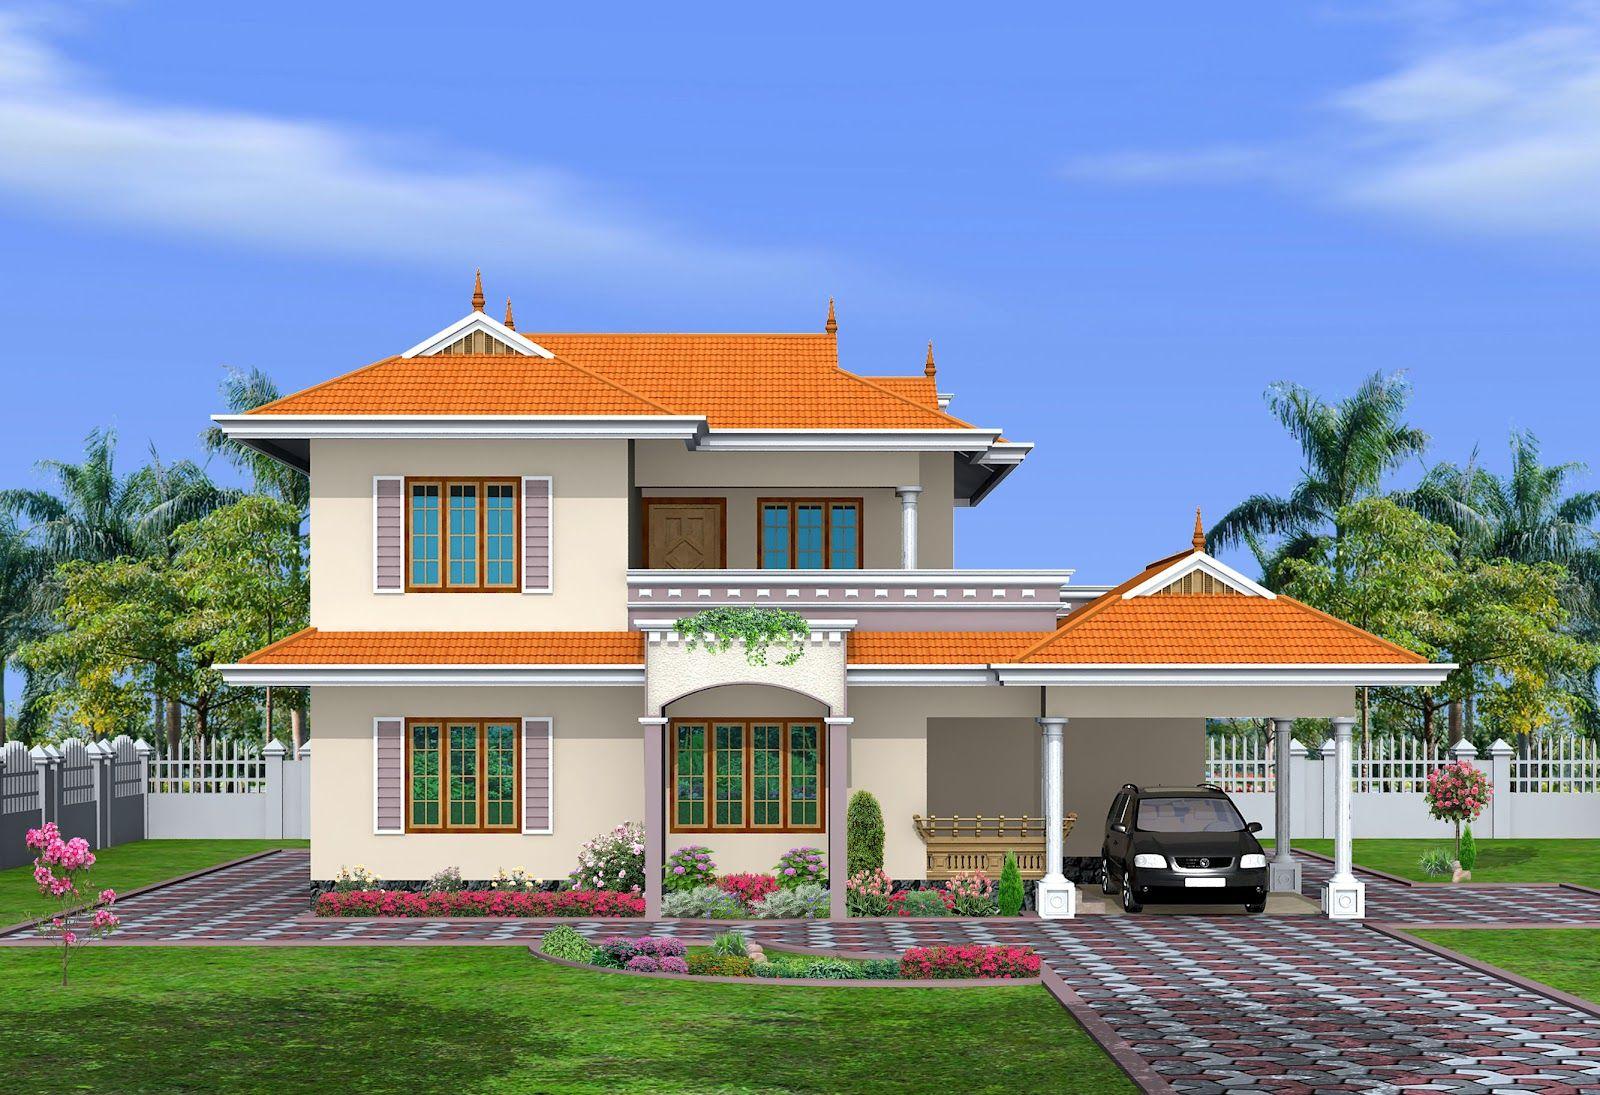 2250 sq feet kerala traditional style home design idea